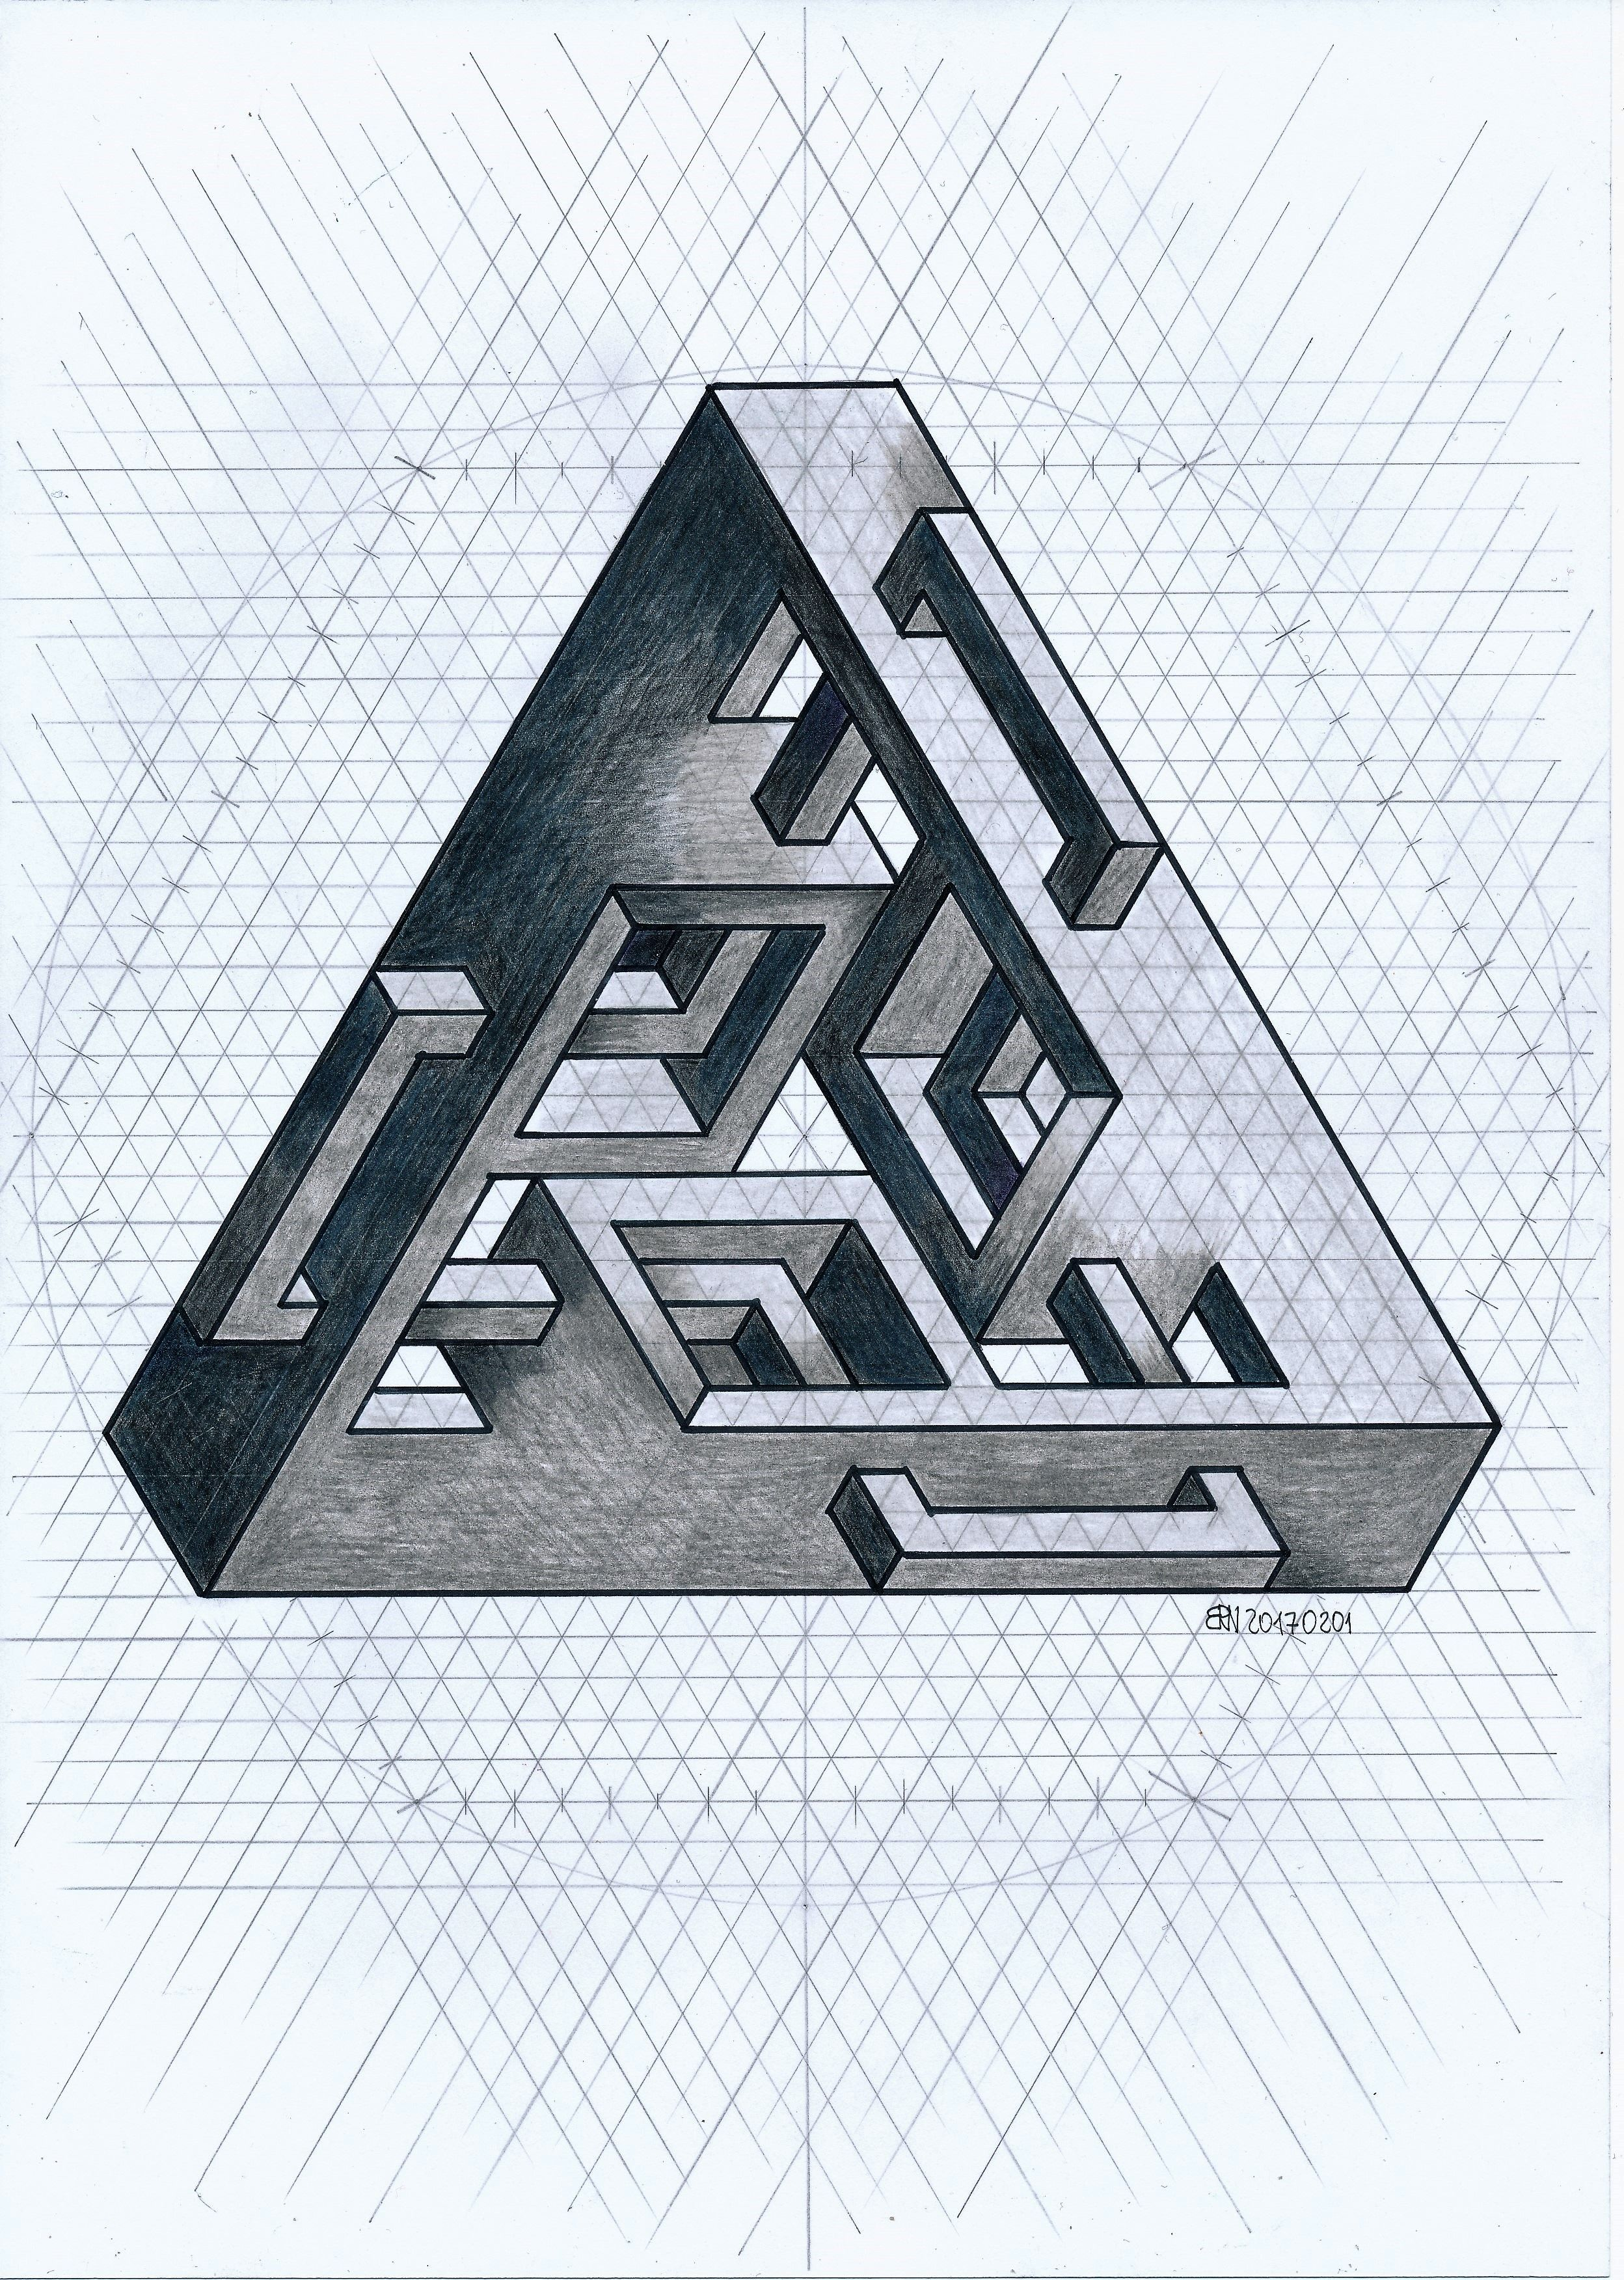 Impossible Isometric Penrose Triangle